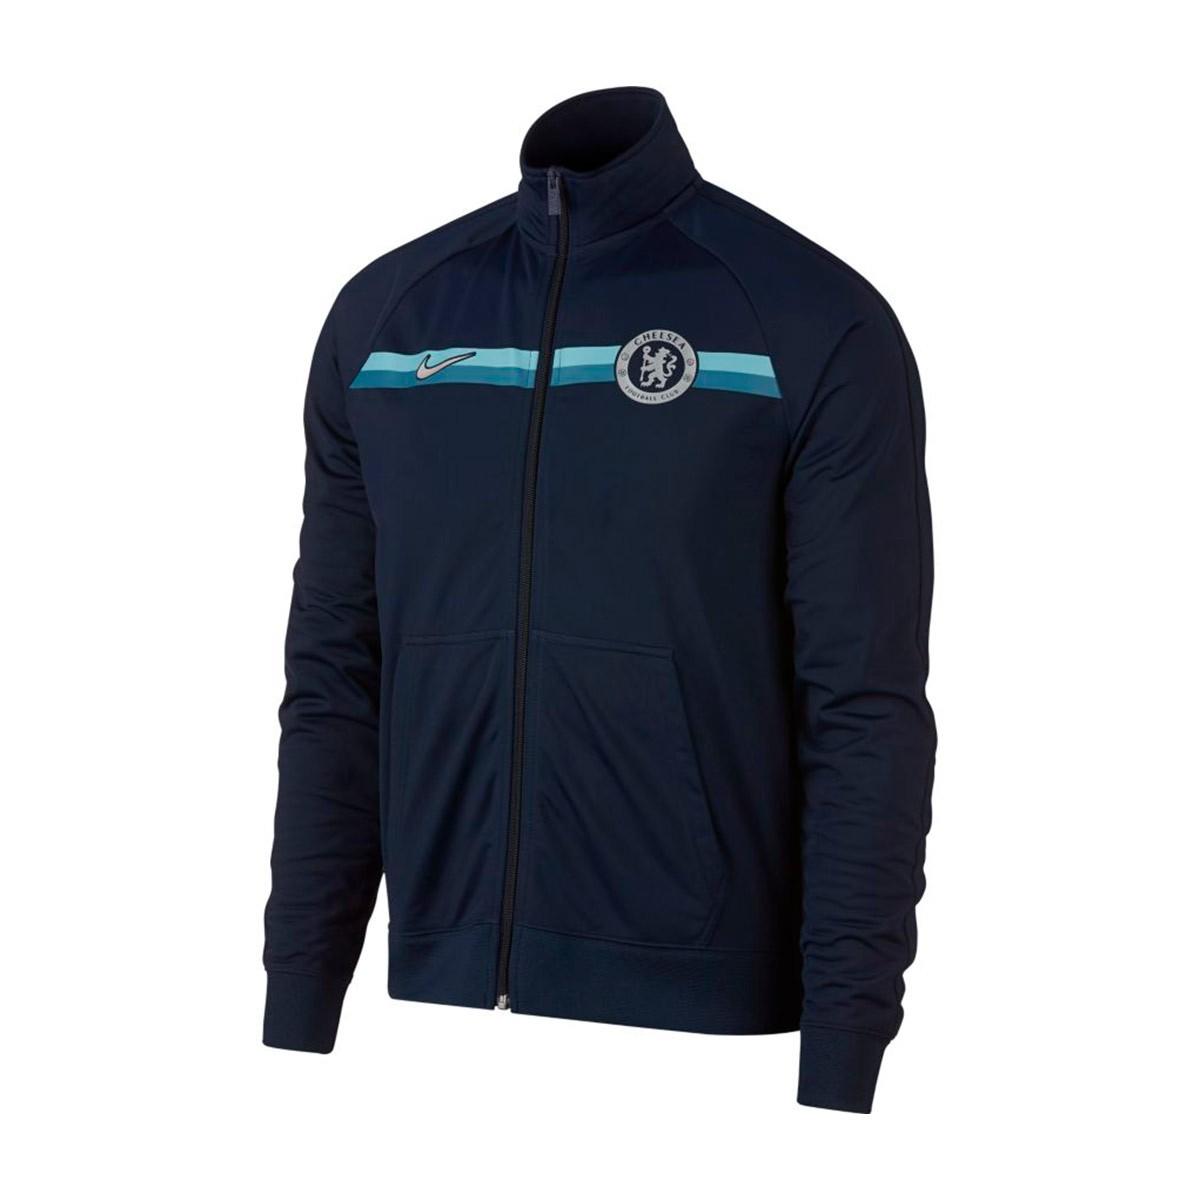 Nike Chelsea FC 2018 2019 Jacket